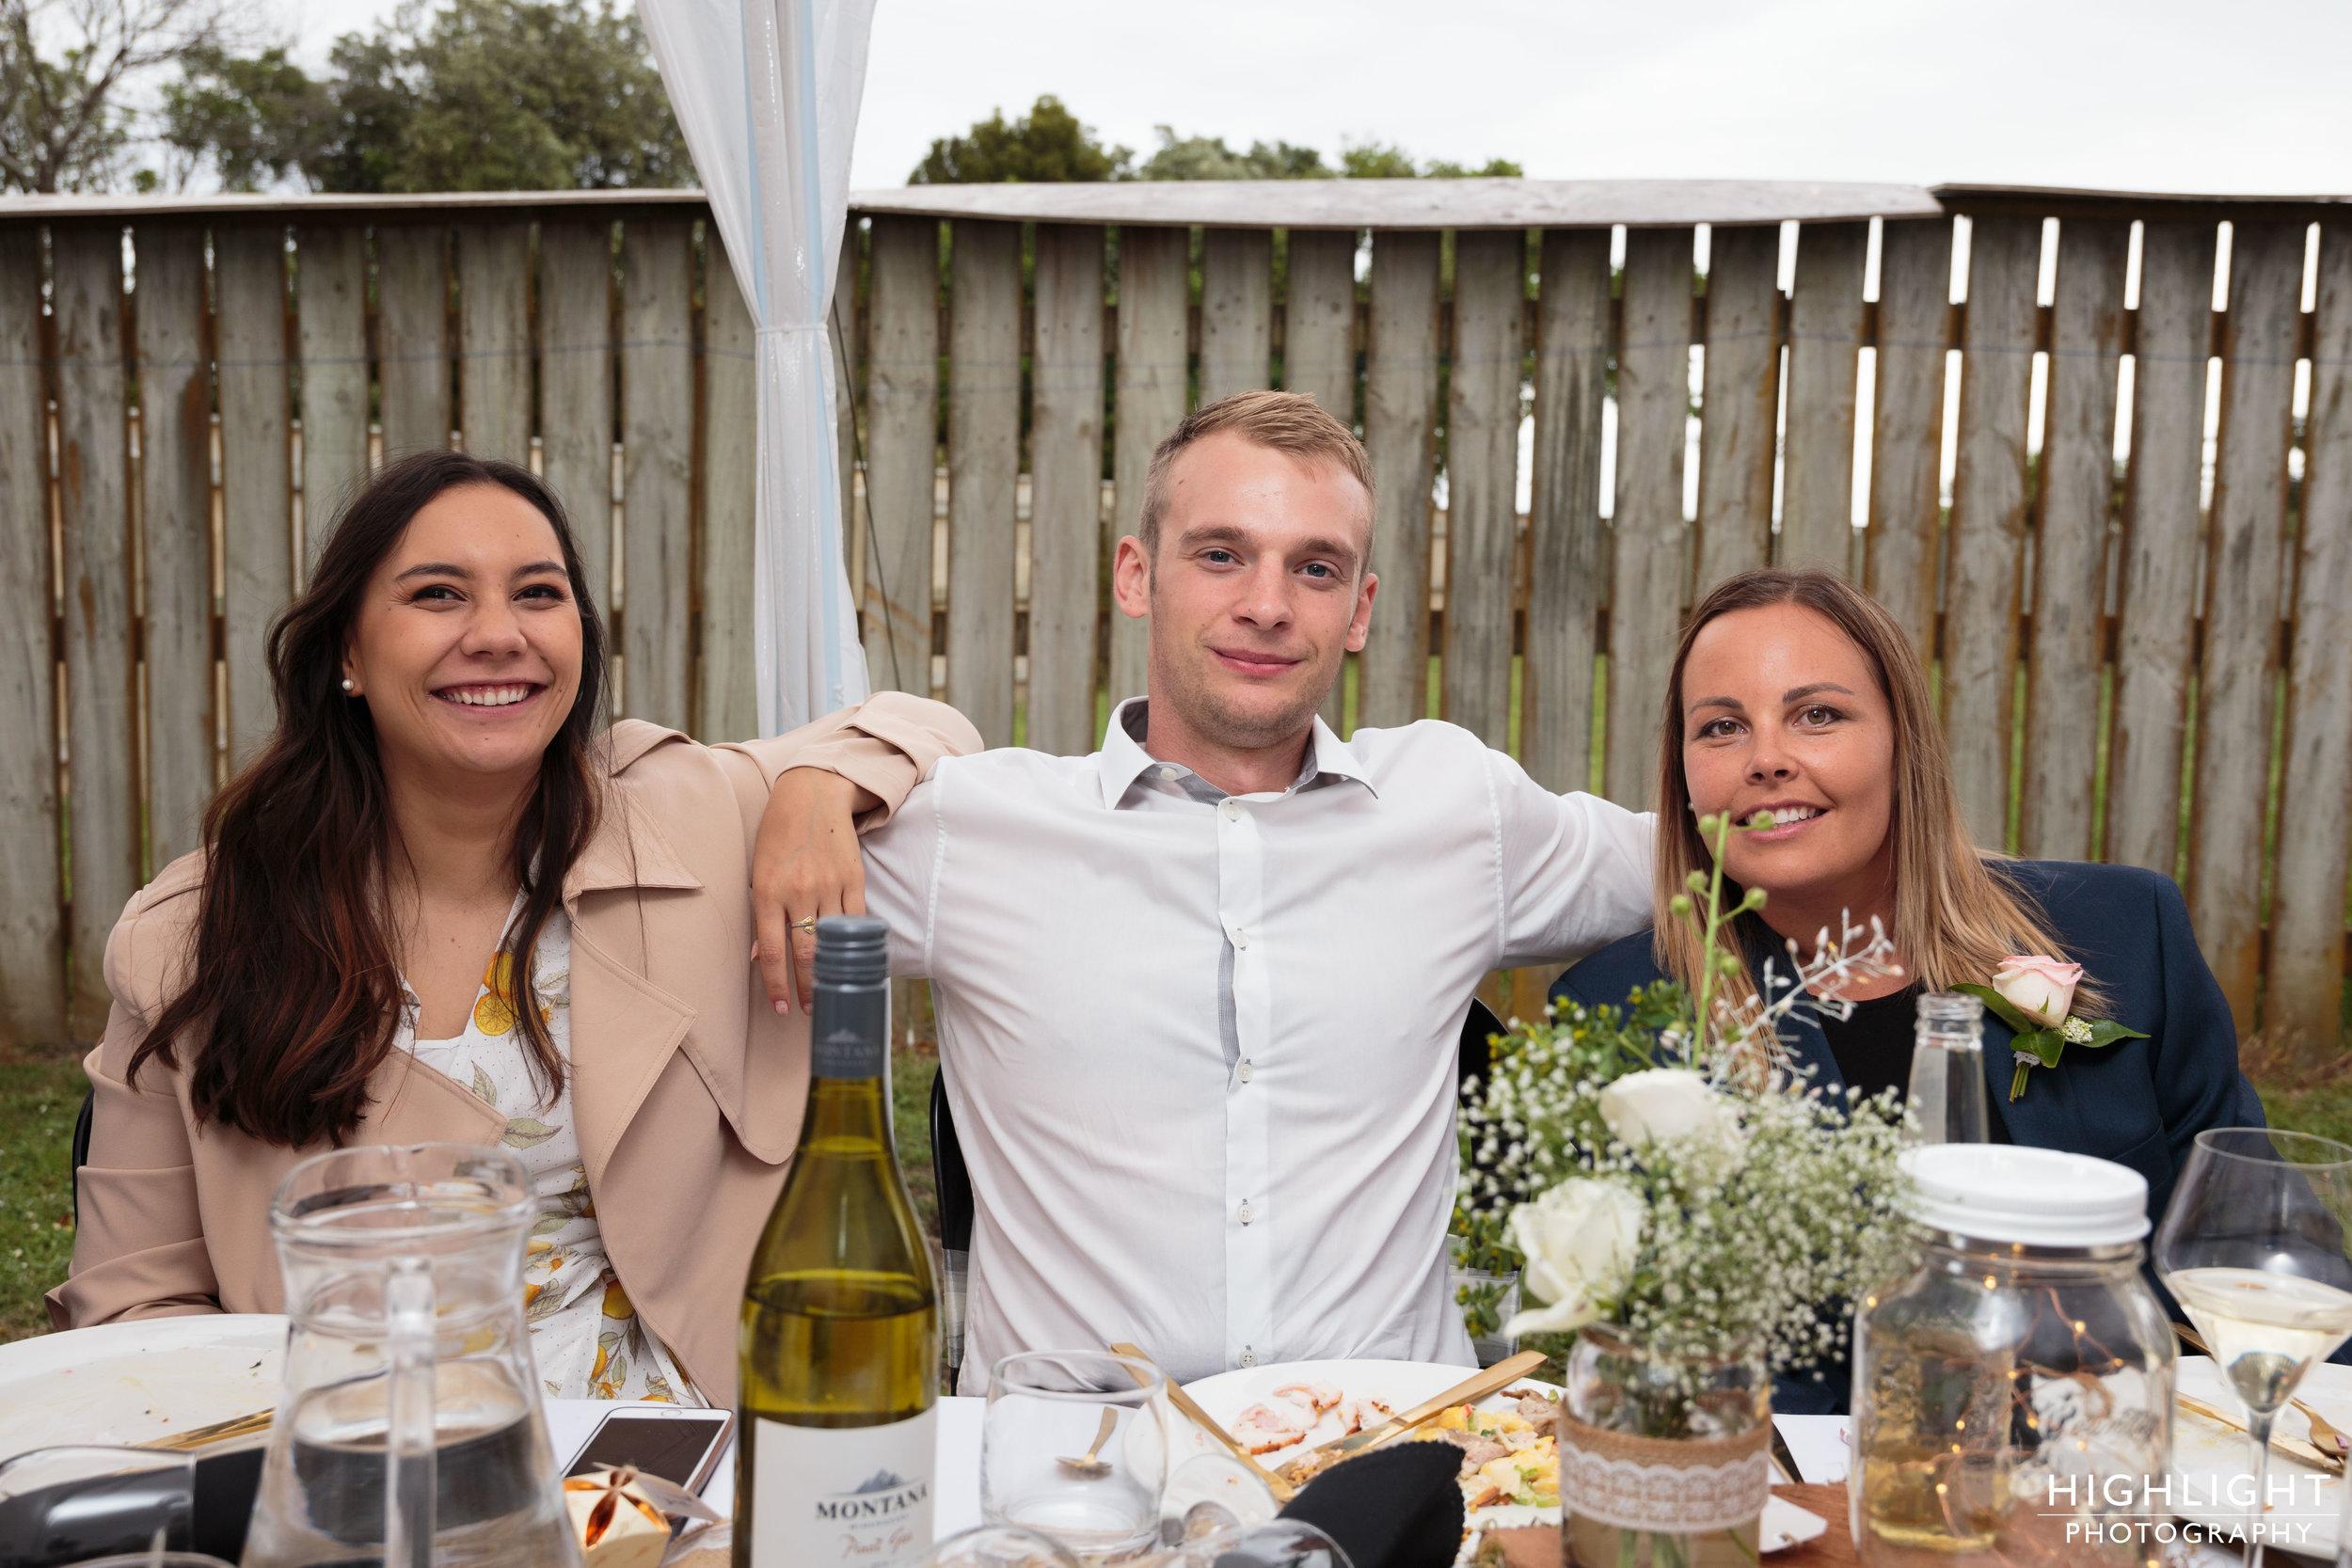 JM-2017-Highlight-wedding-photography-palmerston-north-new-zealand-167.jpg